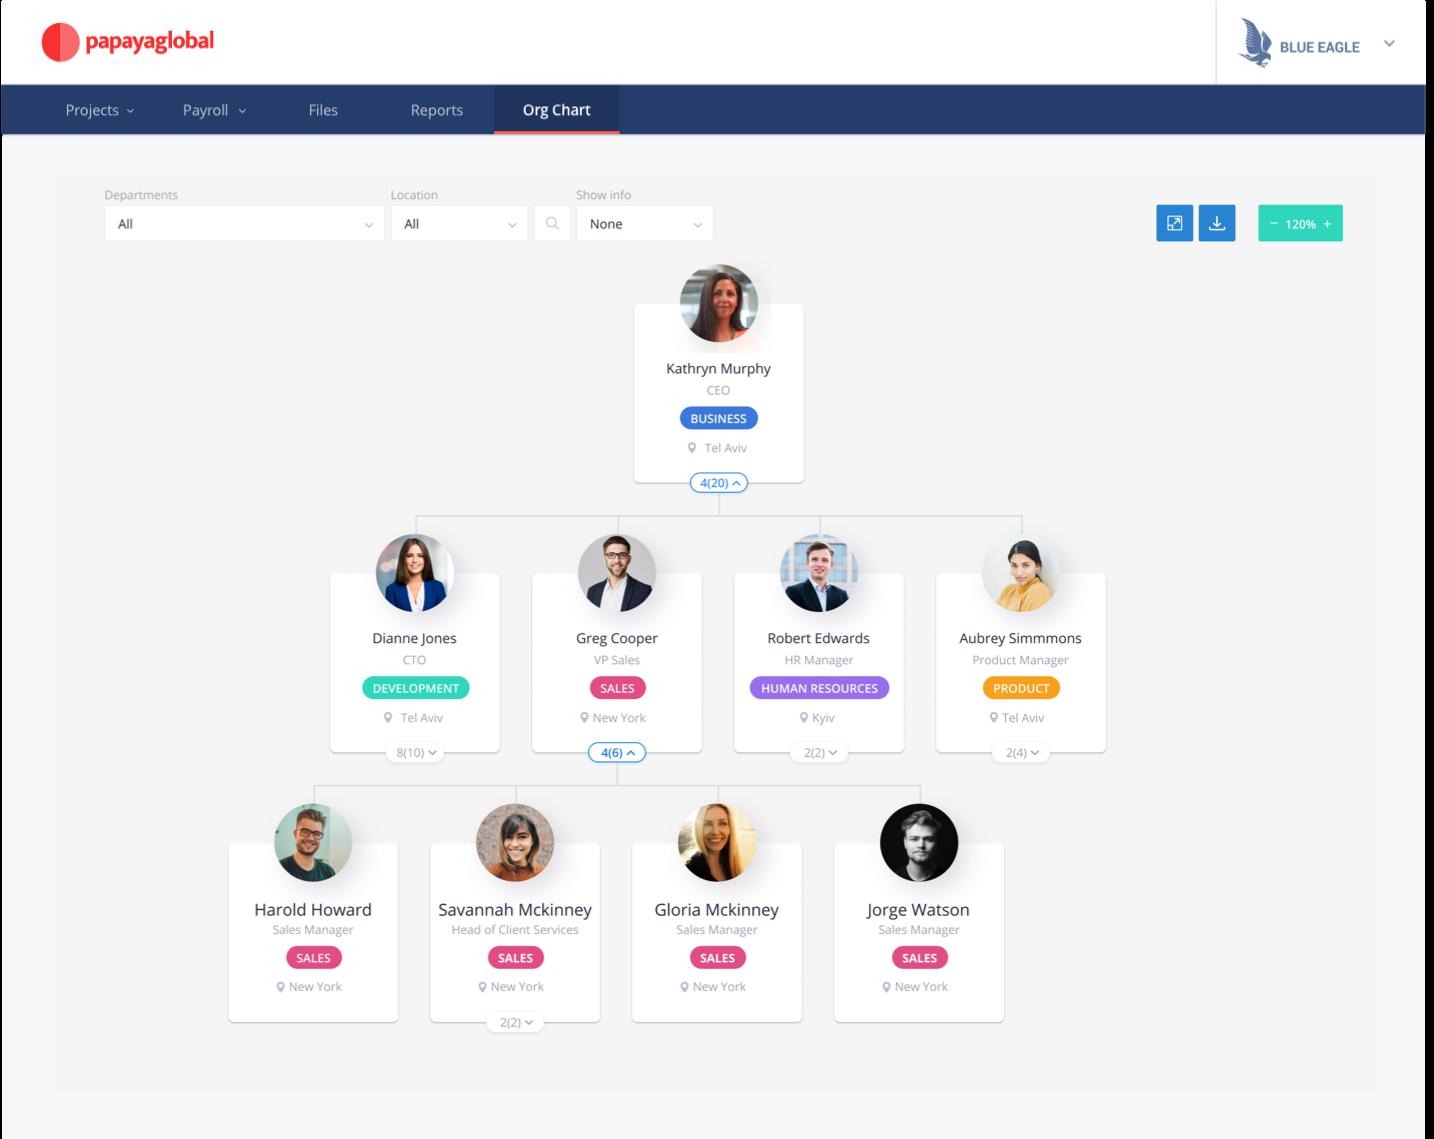 Papaya Global - Org Chart